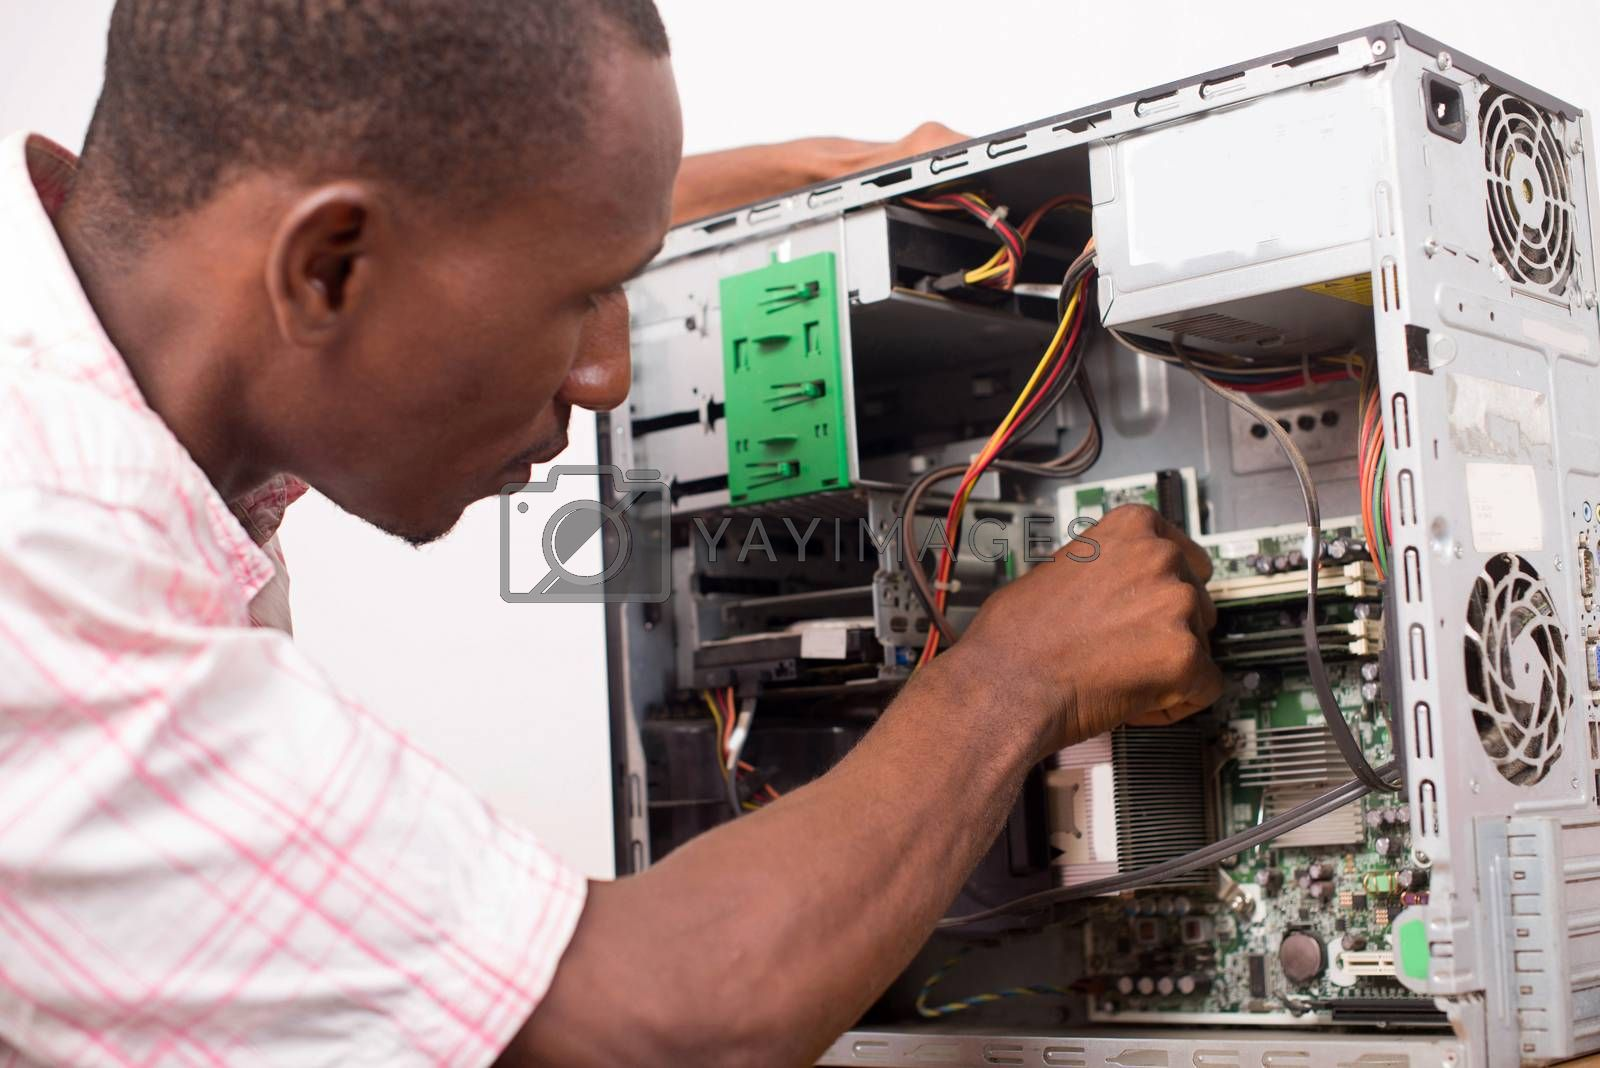 technician repairing computer equipment. by vystek